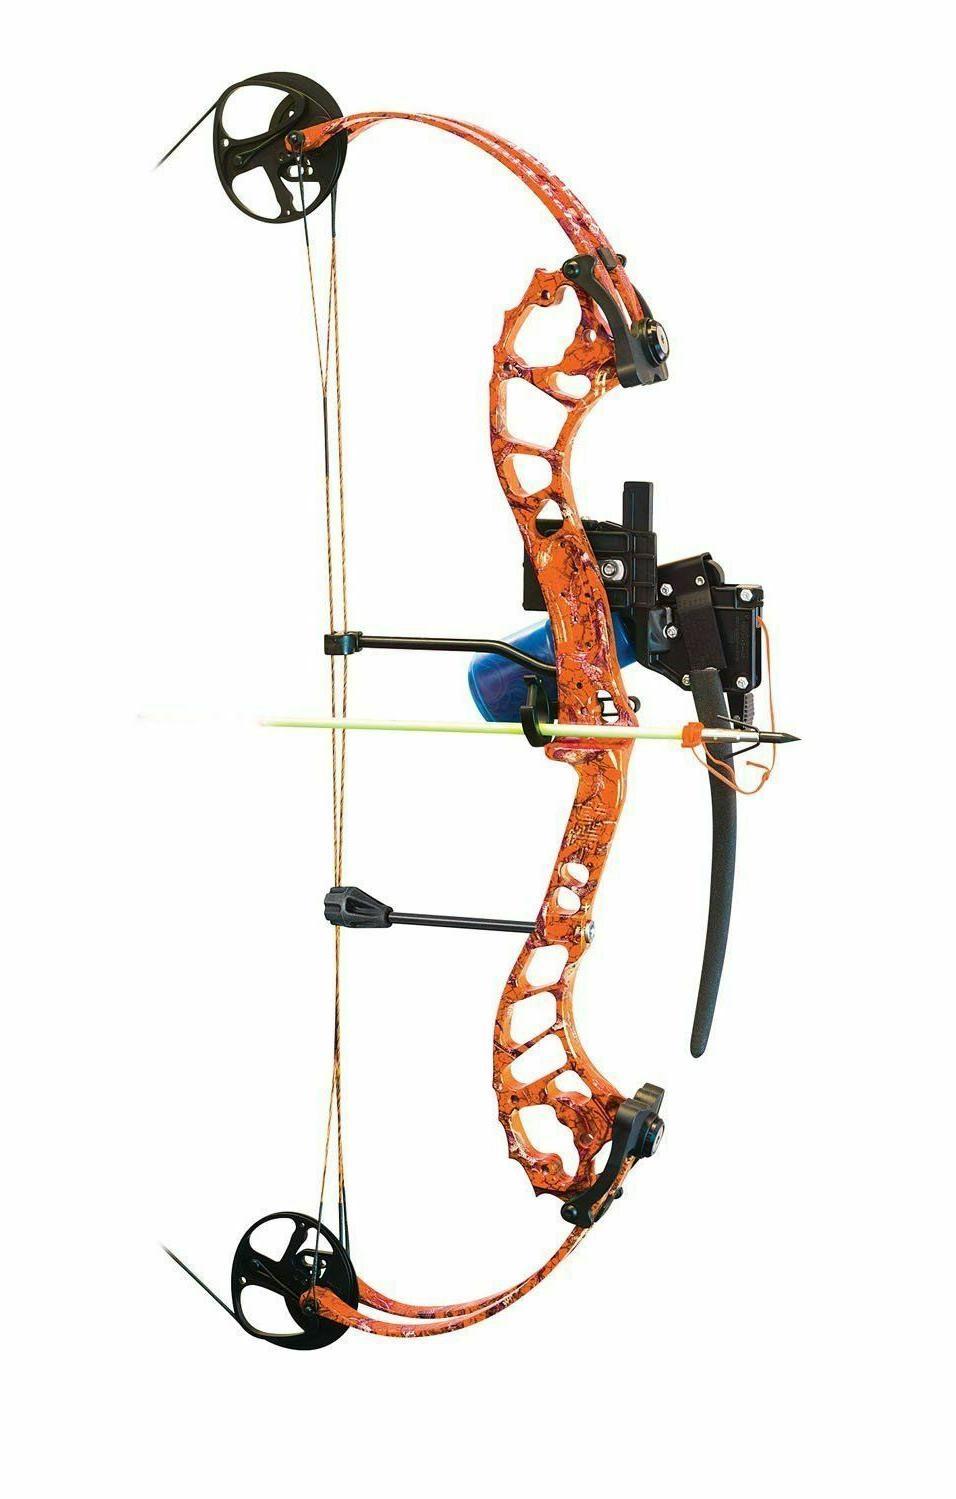 mudd dawg compound bow bowfishing rig right